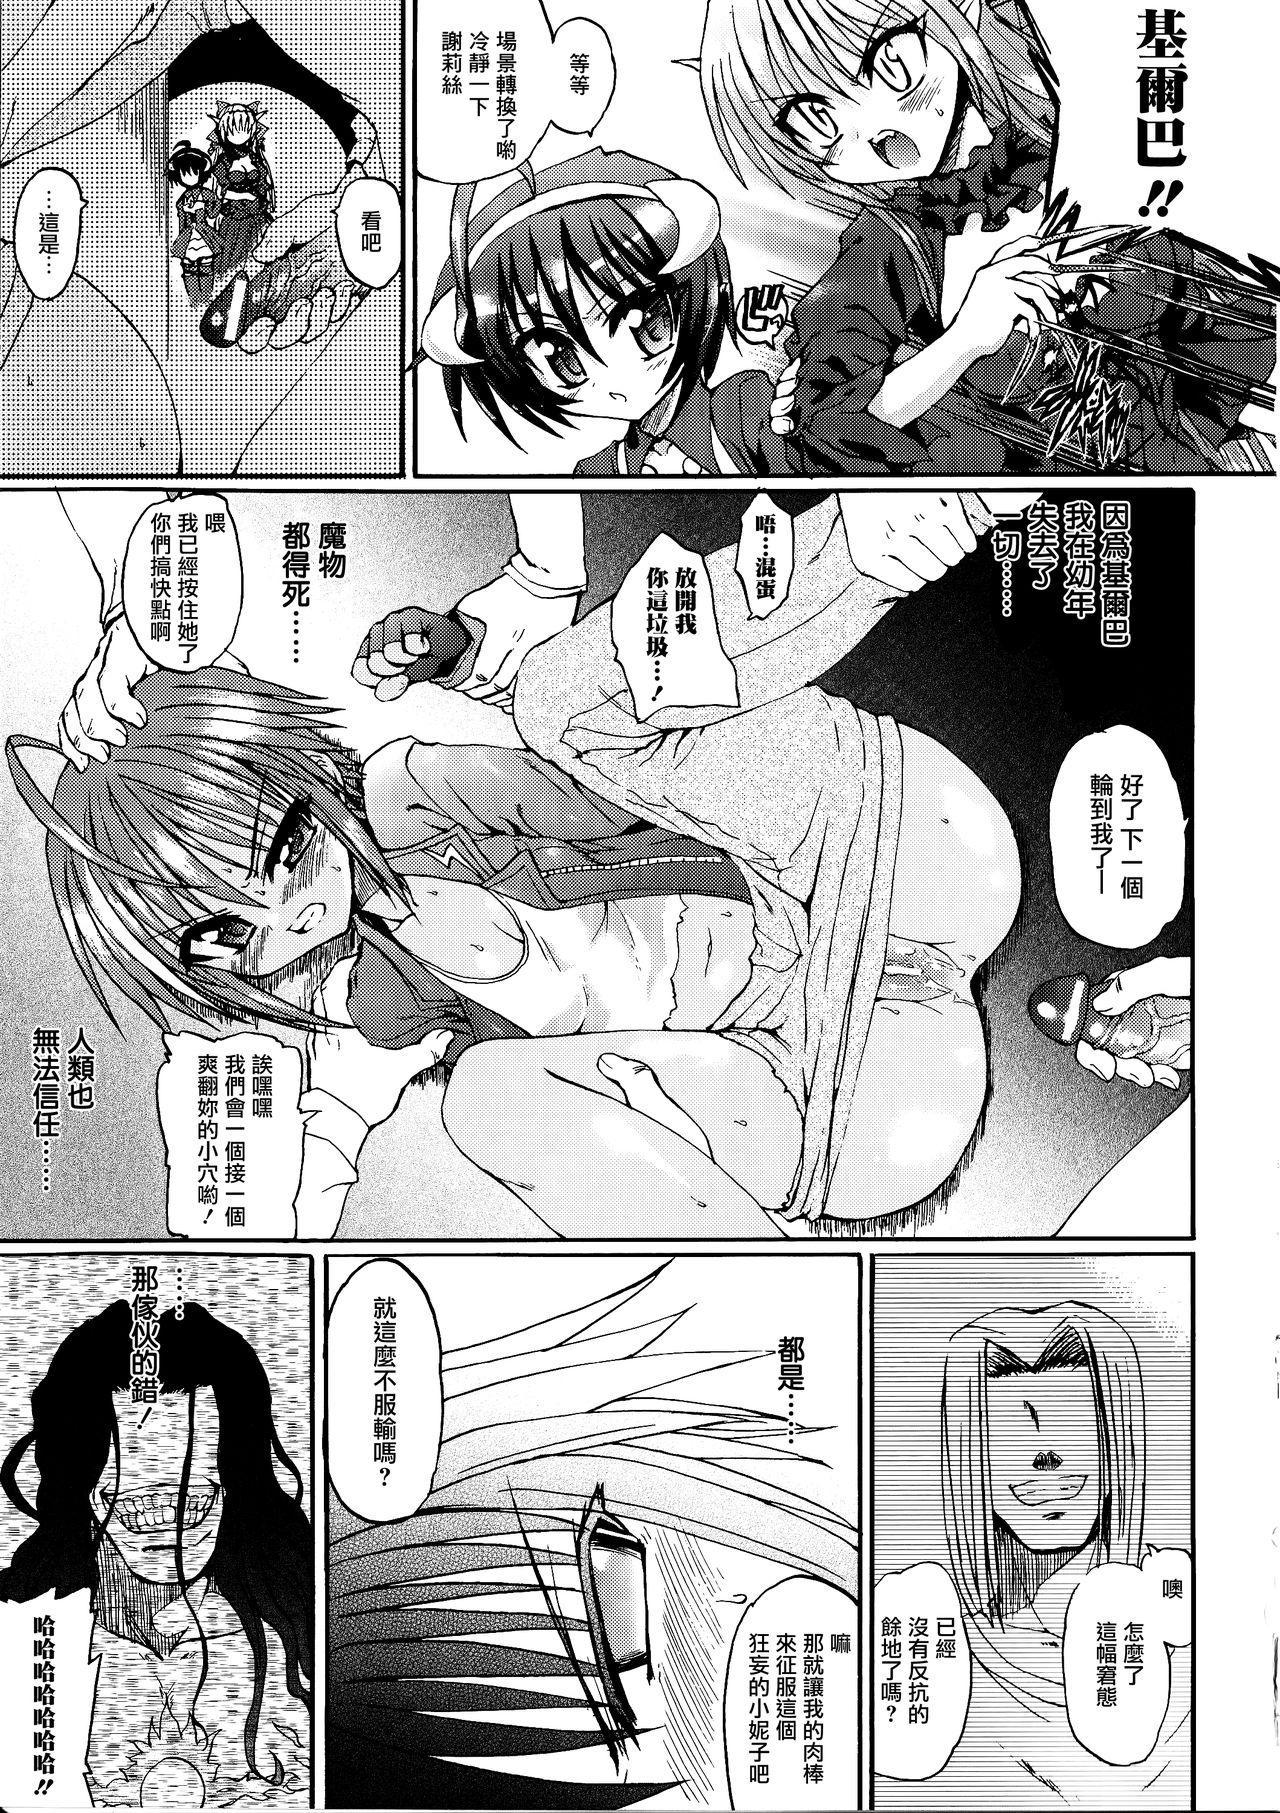 Ma ga Ochiru Yoru Demonic Imitator CH.1-7 59